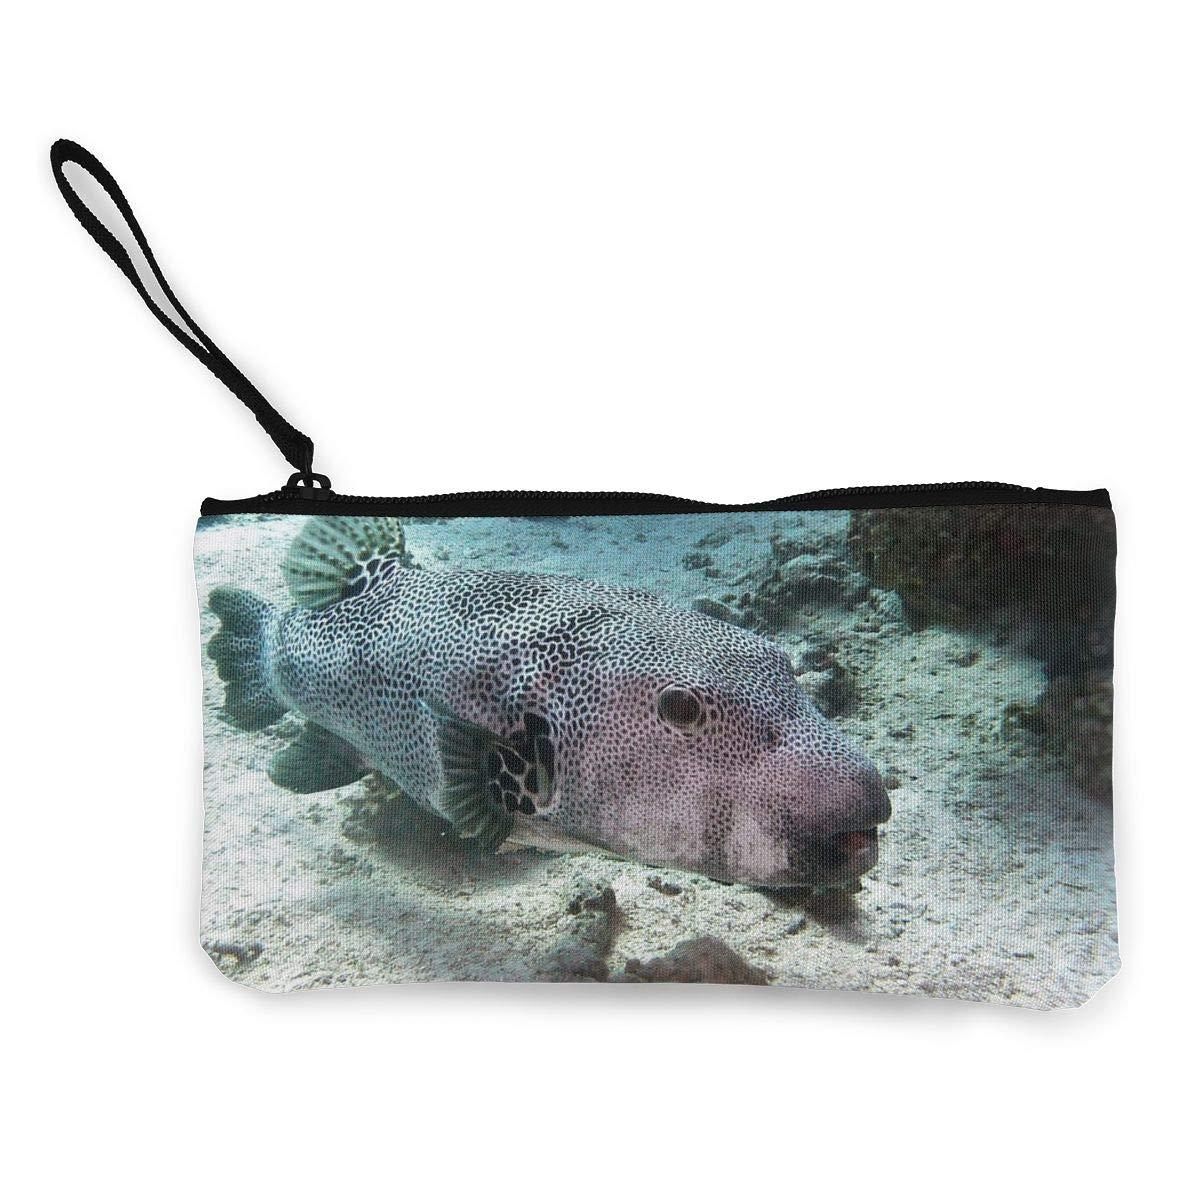 Pocket Handbag Fashion Print Coin Purse Makeup Bag Zip Canvas Purse Wallet